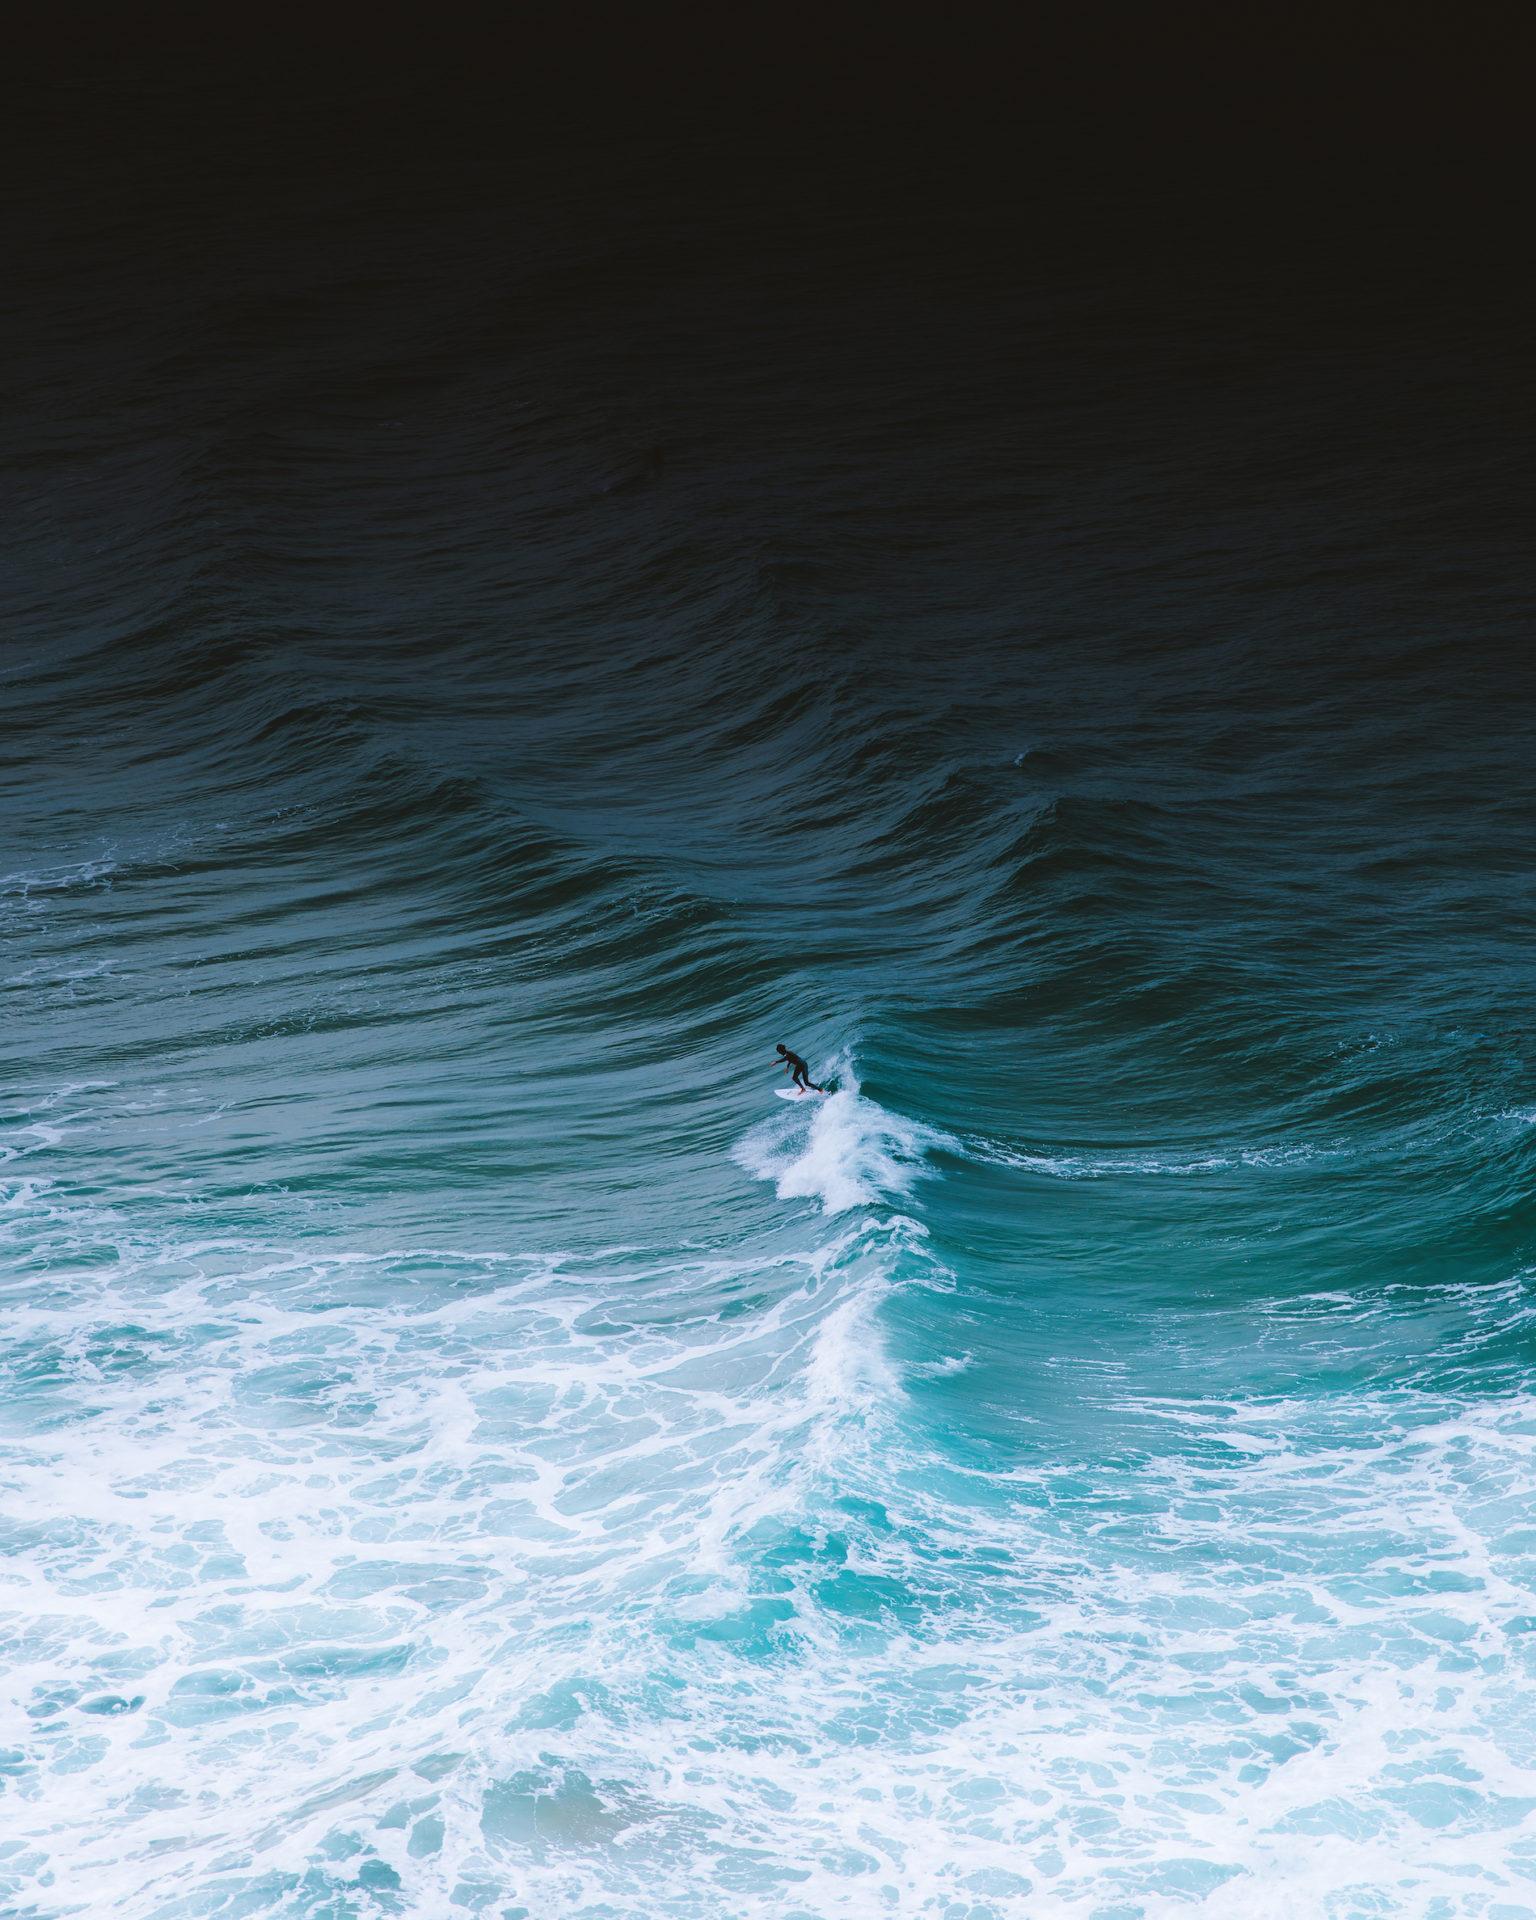 vague ocean avec ecume